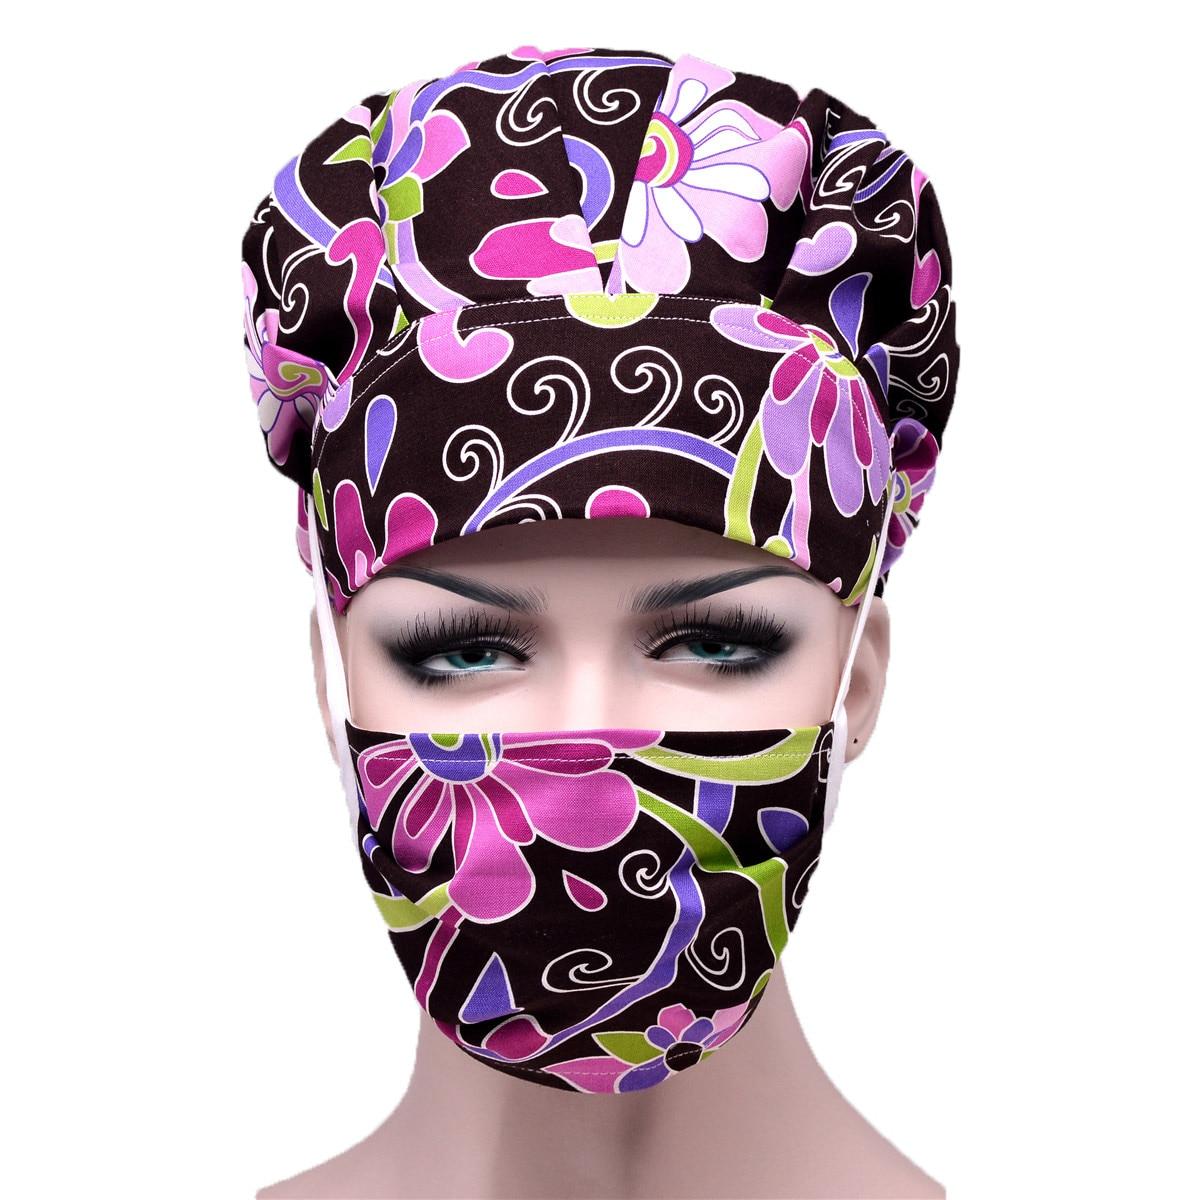 Women Hospital Cap Mask Cartoon Flower Printed Doctor Nurses Scrub Cap + Mask Surgical Surgery Work Wear Hats Mask Cotton Cover